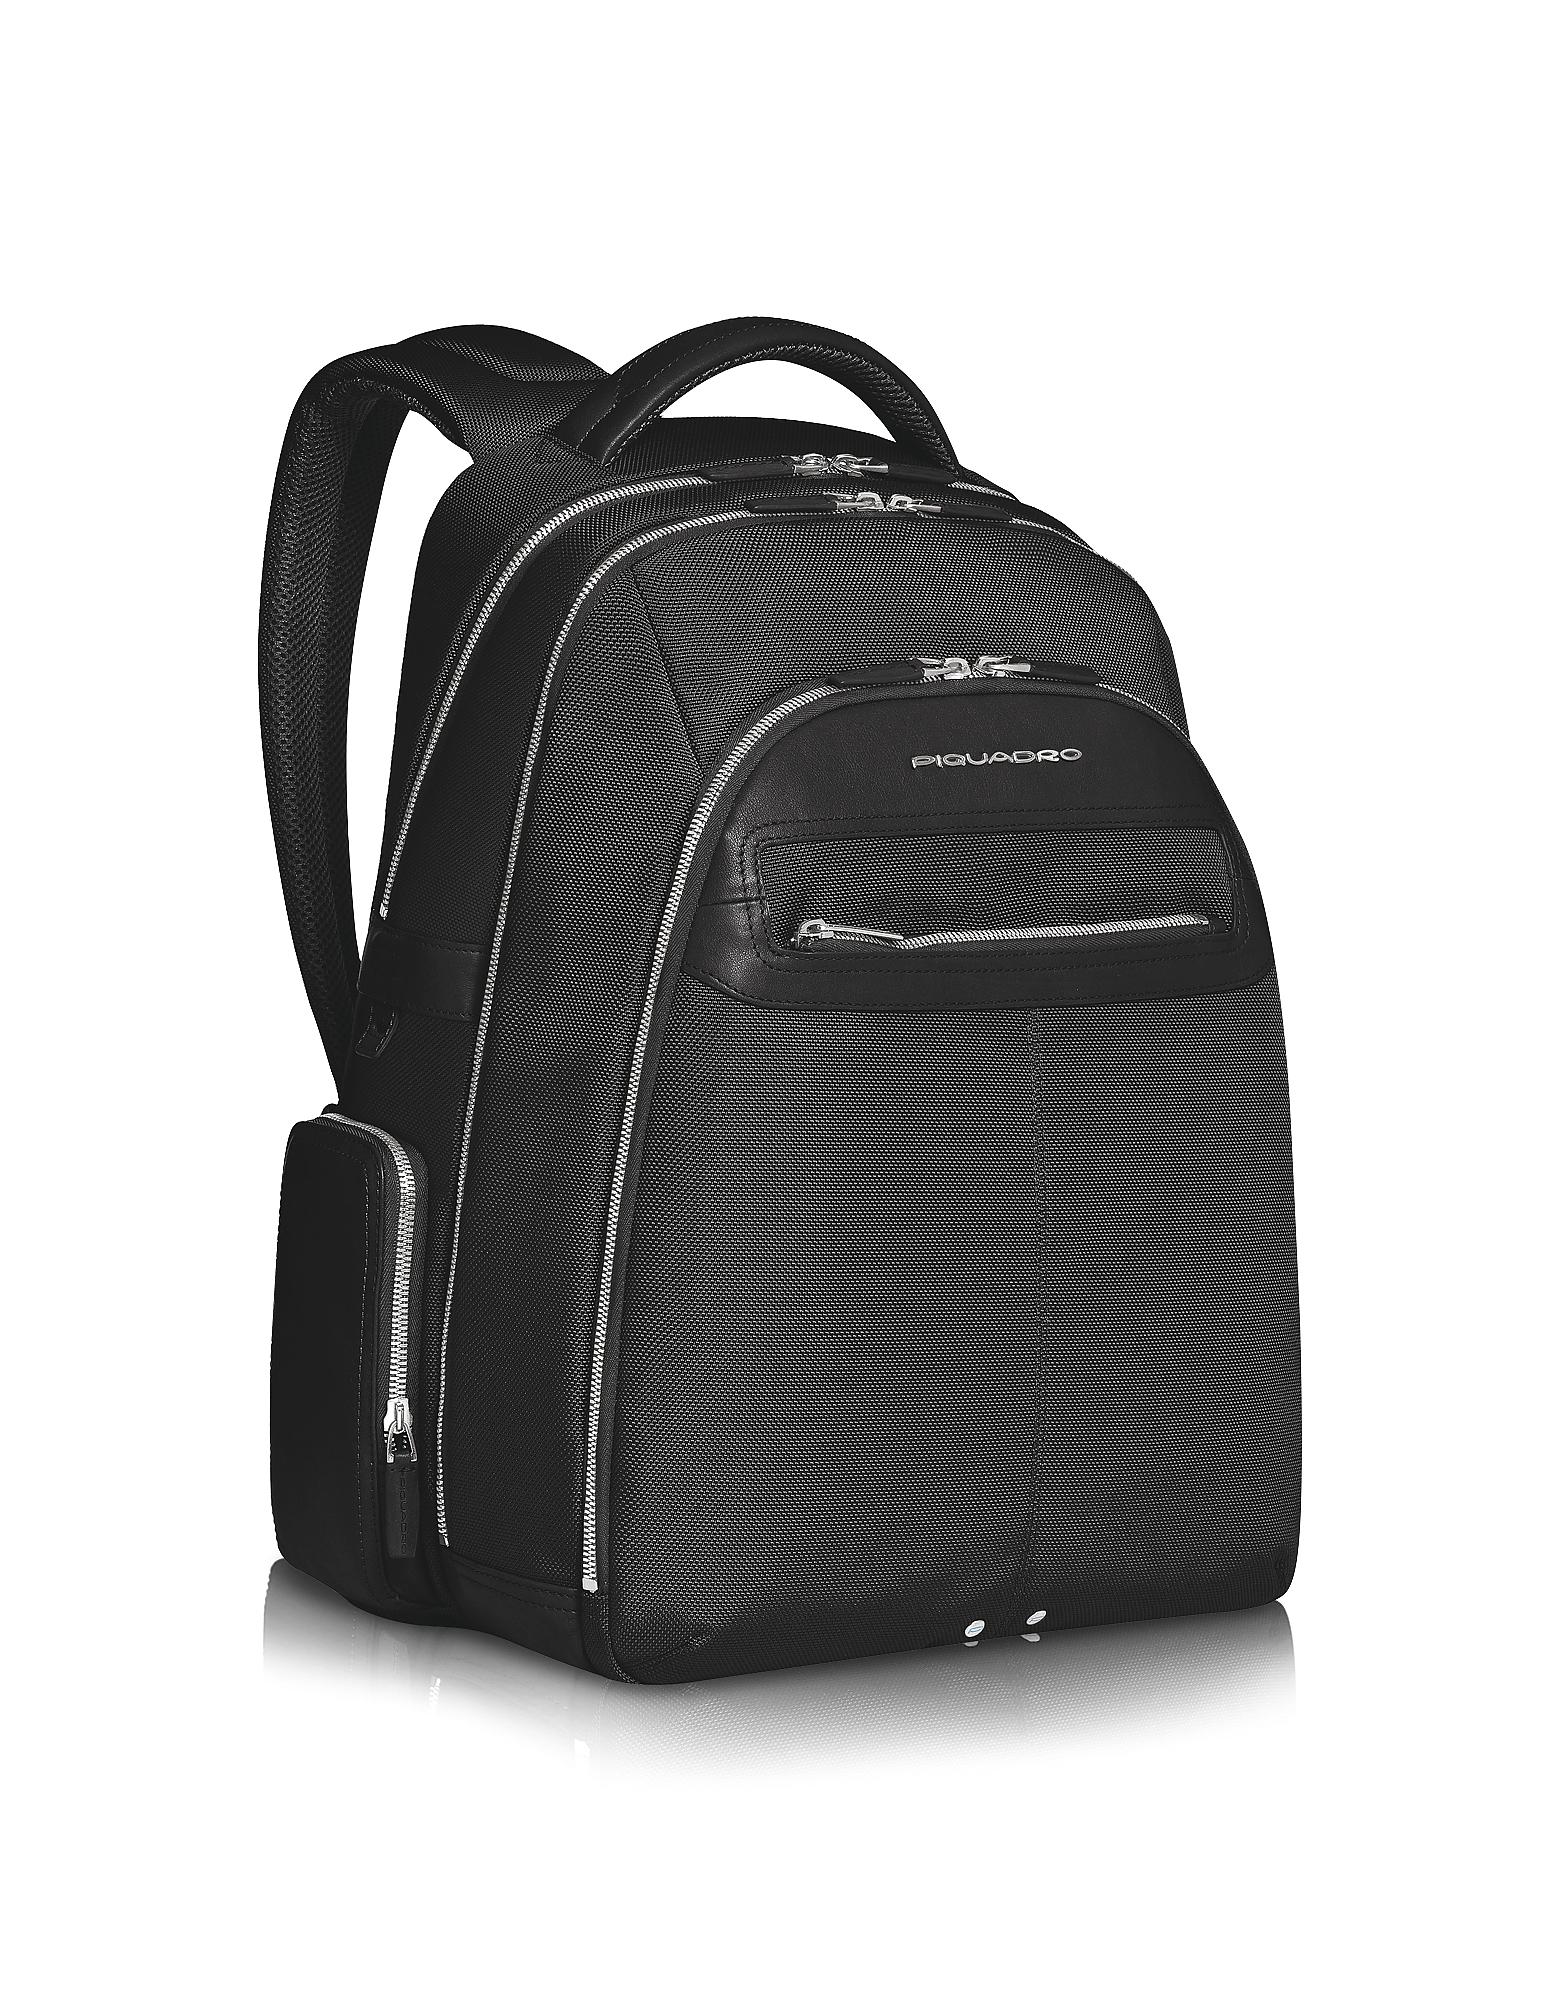 Piquadro Travel Bags, Link - Multi-pocket Laptop Backpack